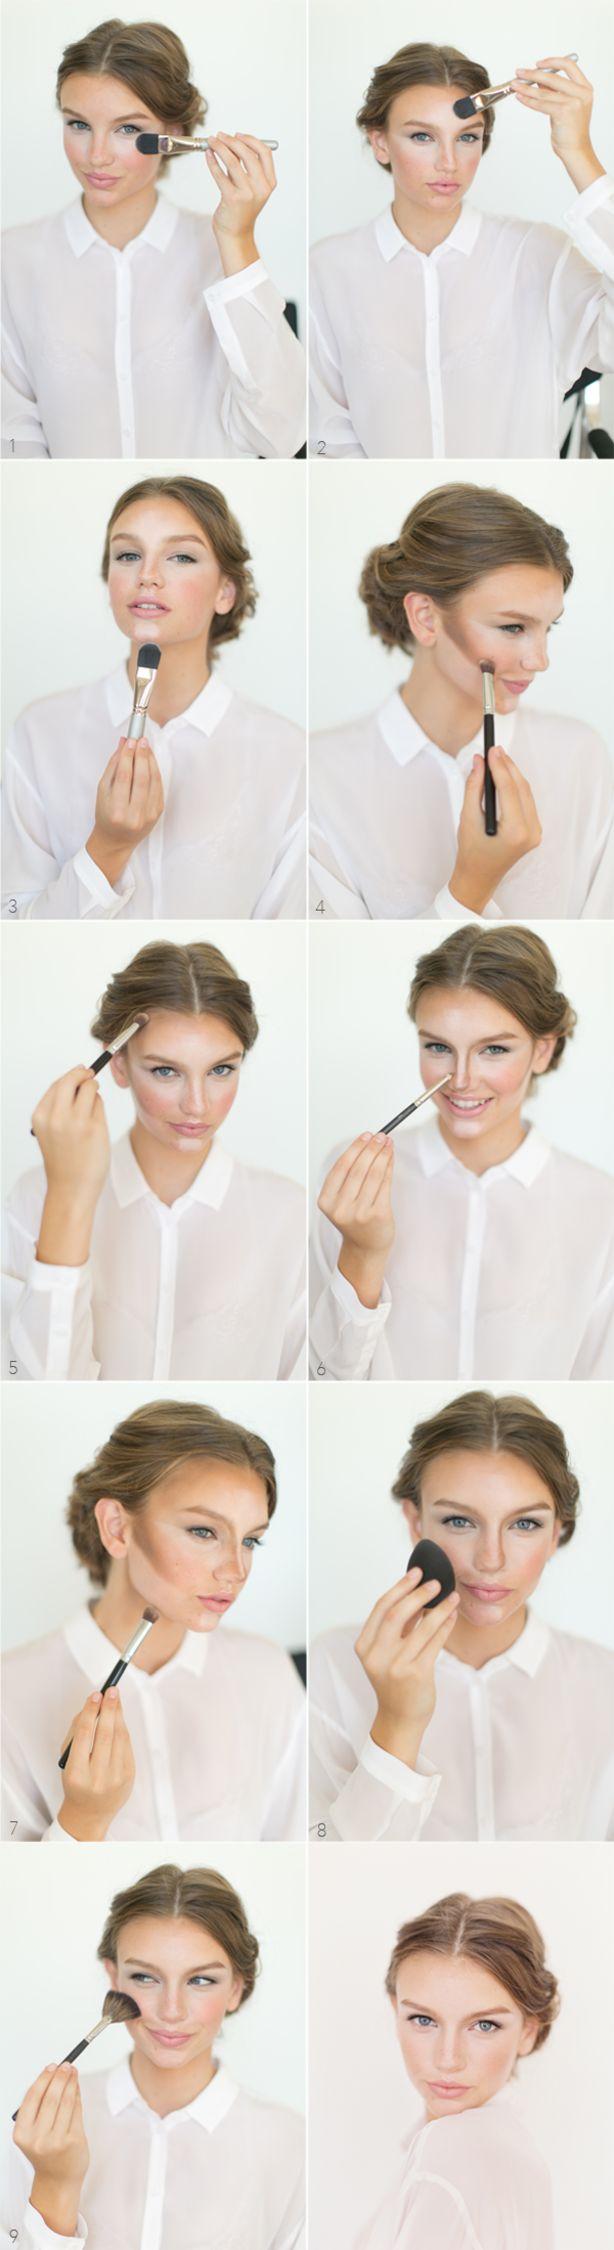 basic make-up tips met Engelse uitleg van een professionele  visagiste